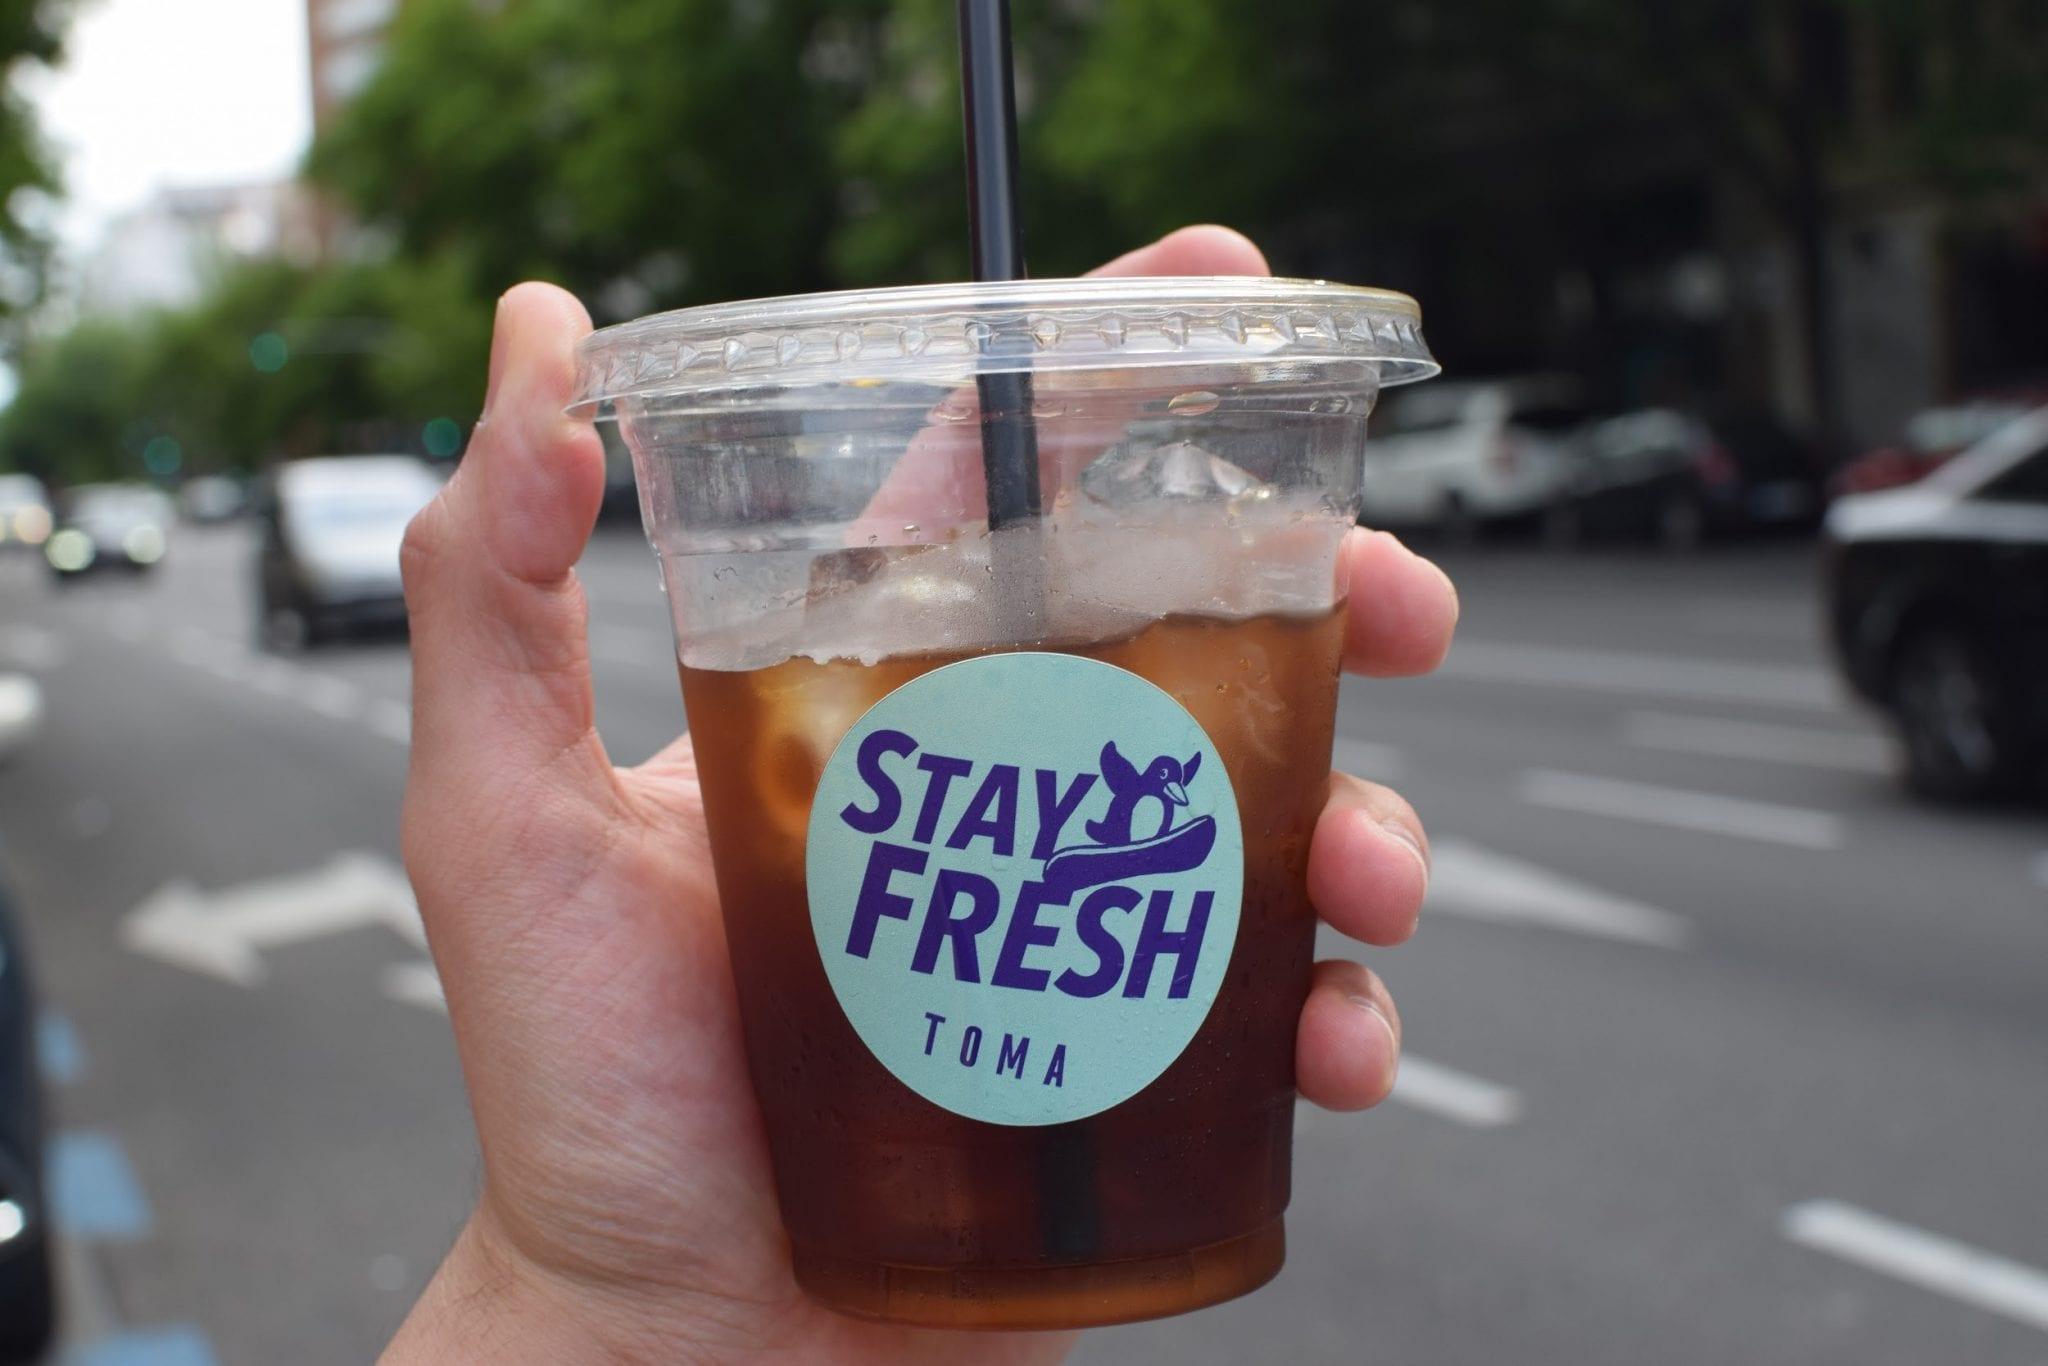 un refrescante vaso de cafe frio